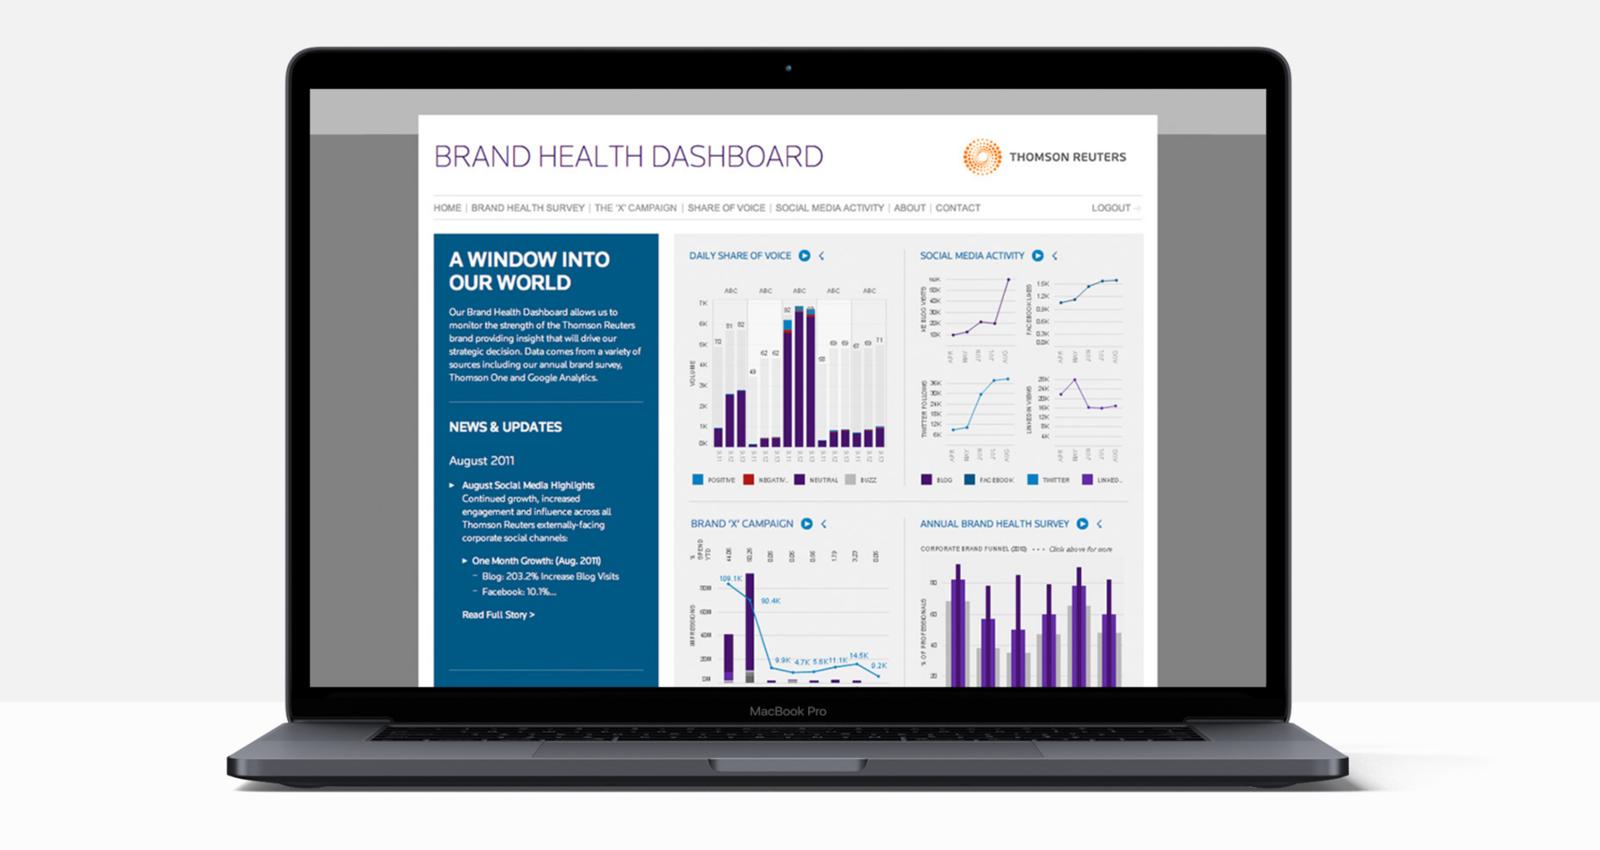 Brand Health Dashboard